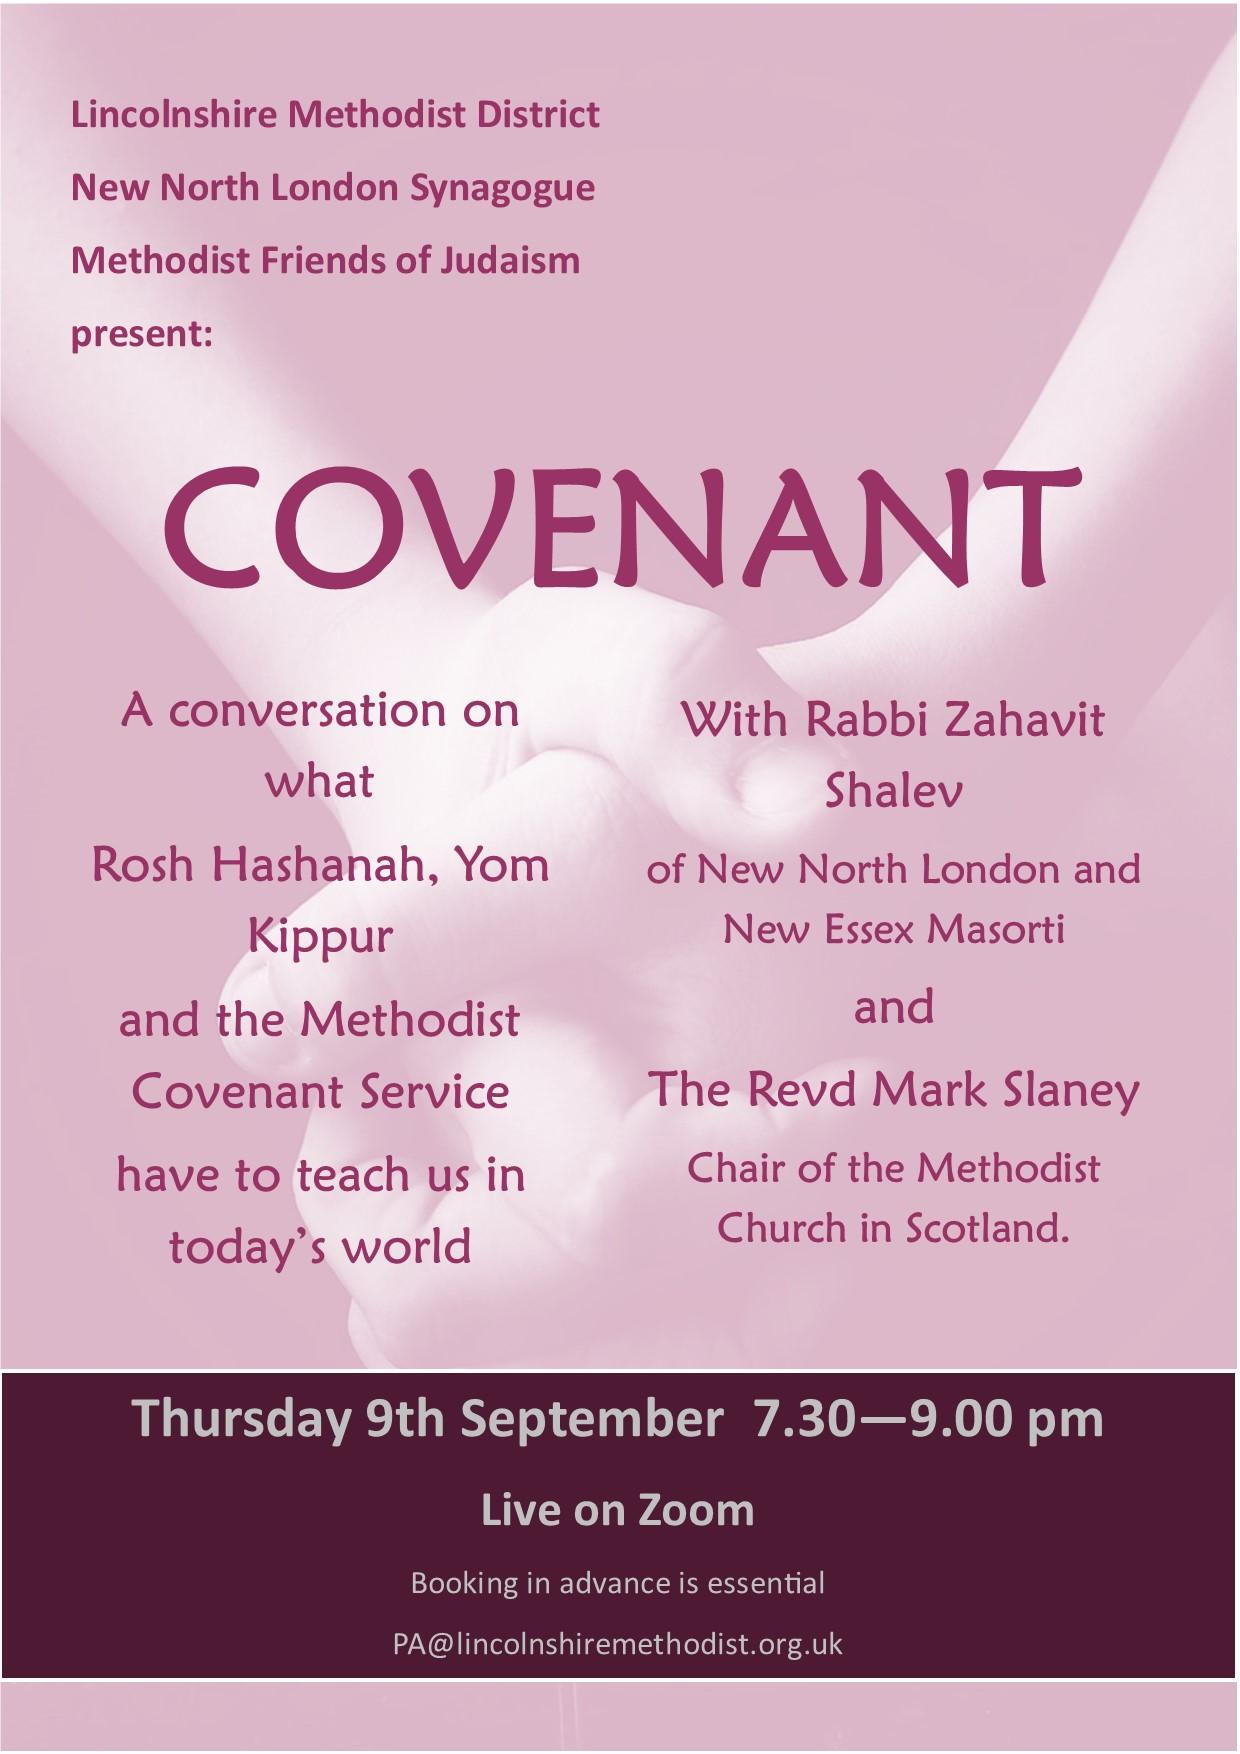 Flyer for Methodist Friends of Judaism Meeting